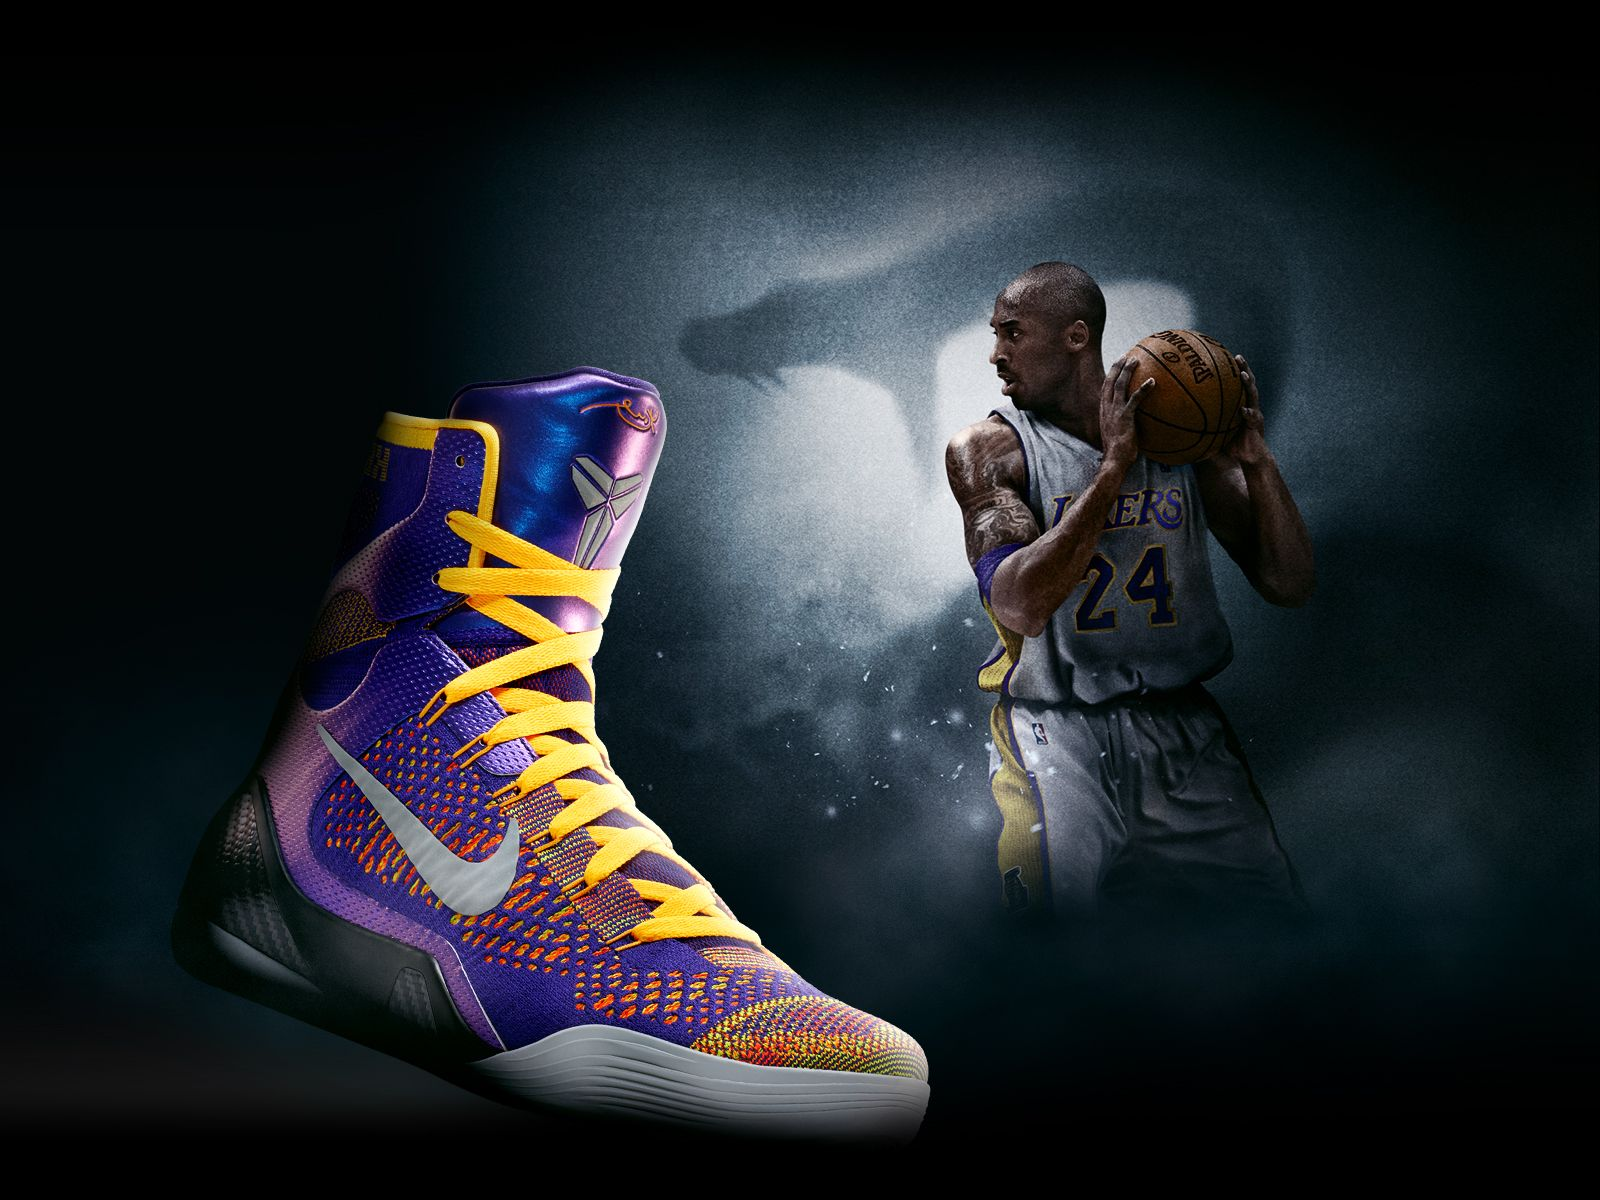 Nike Kobe Wallpapers 1600x1200